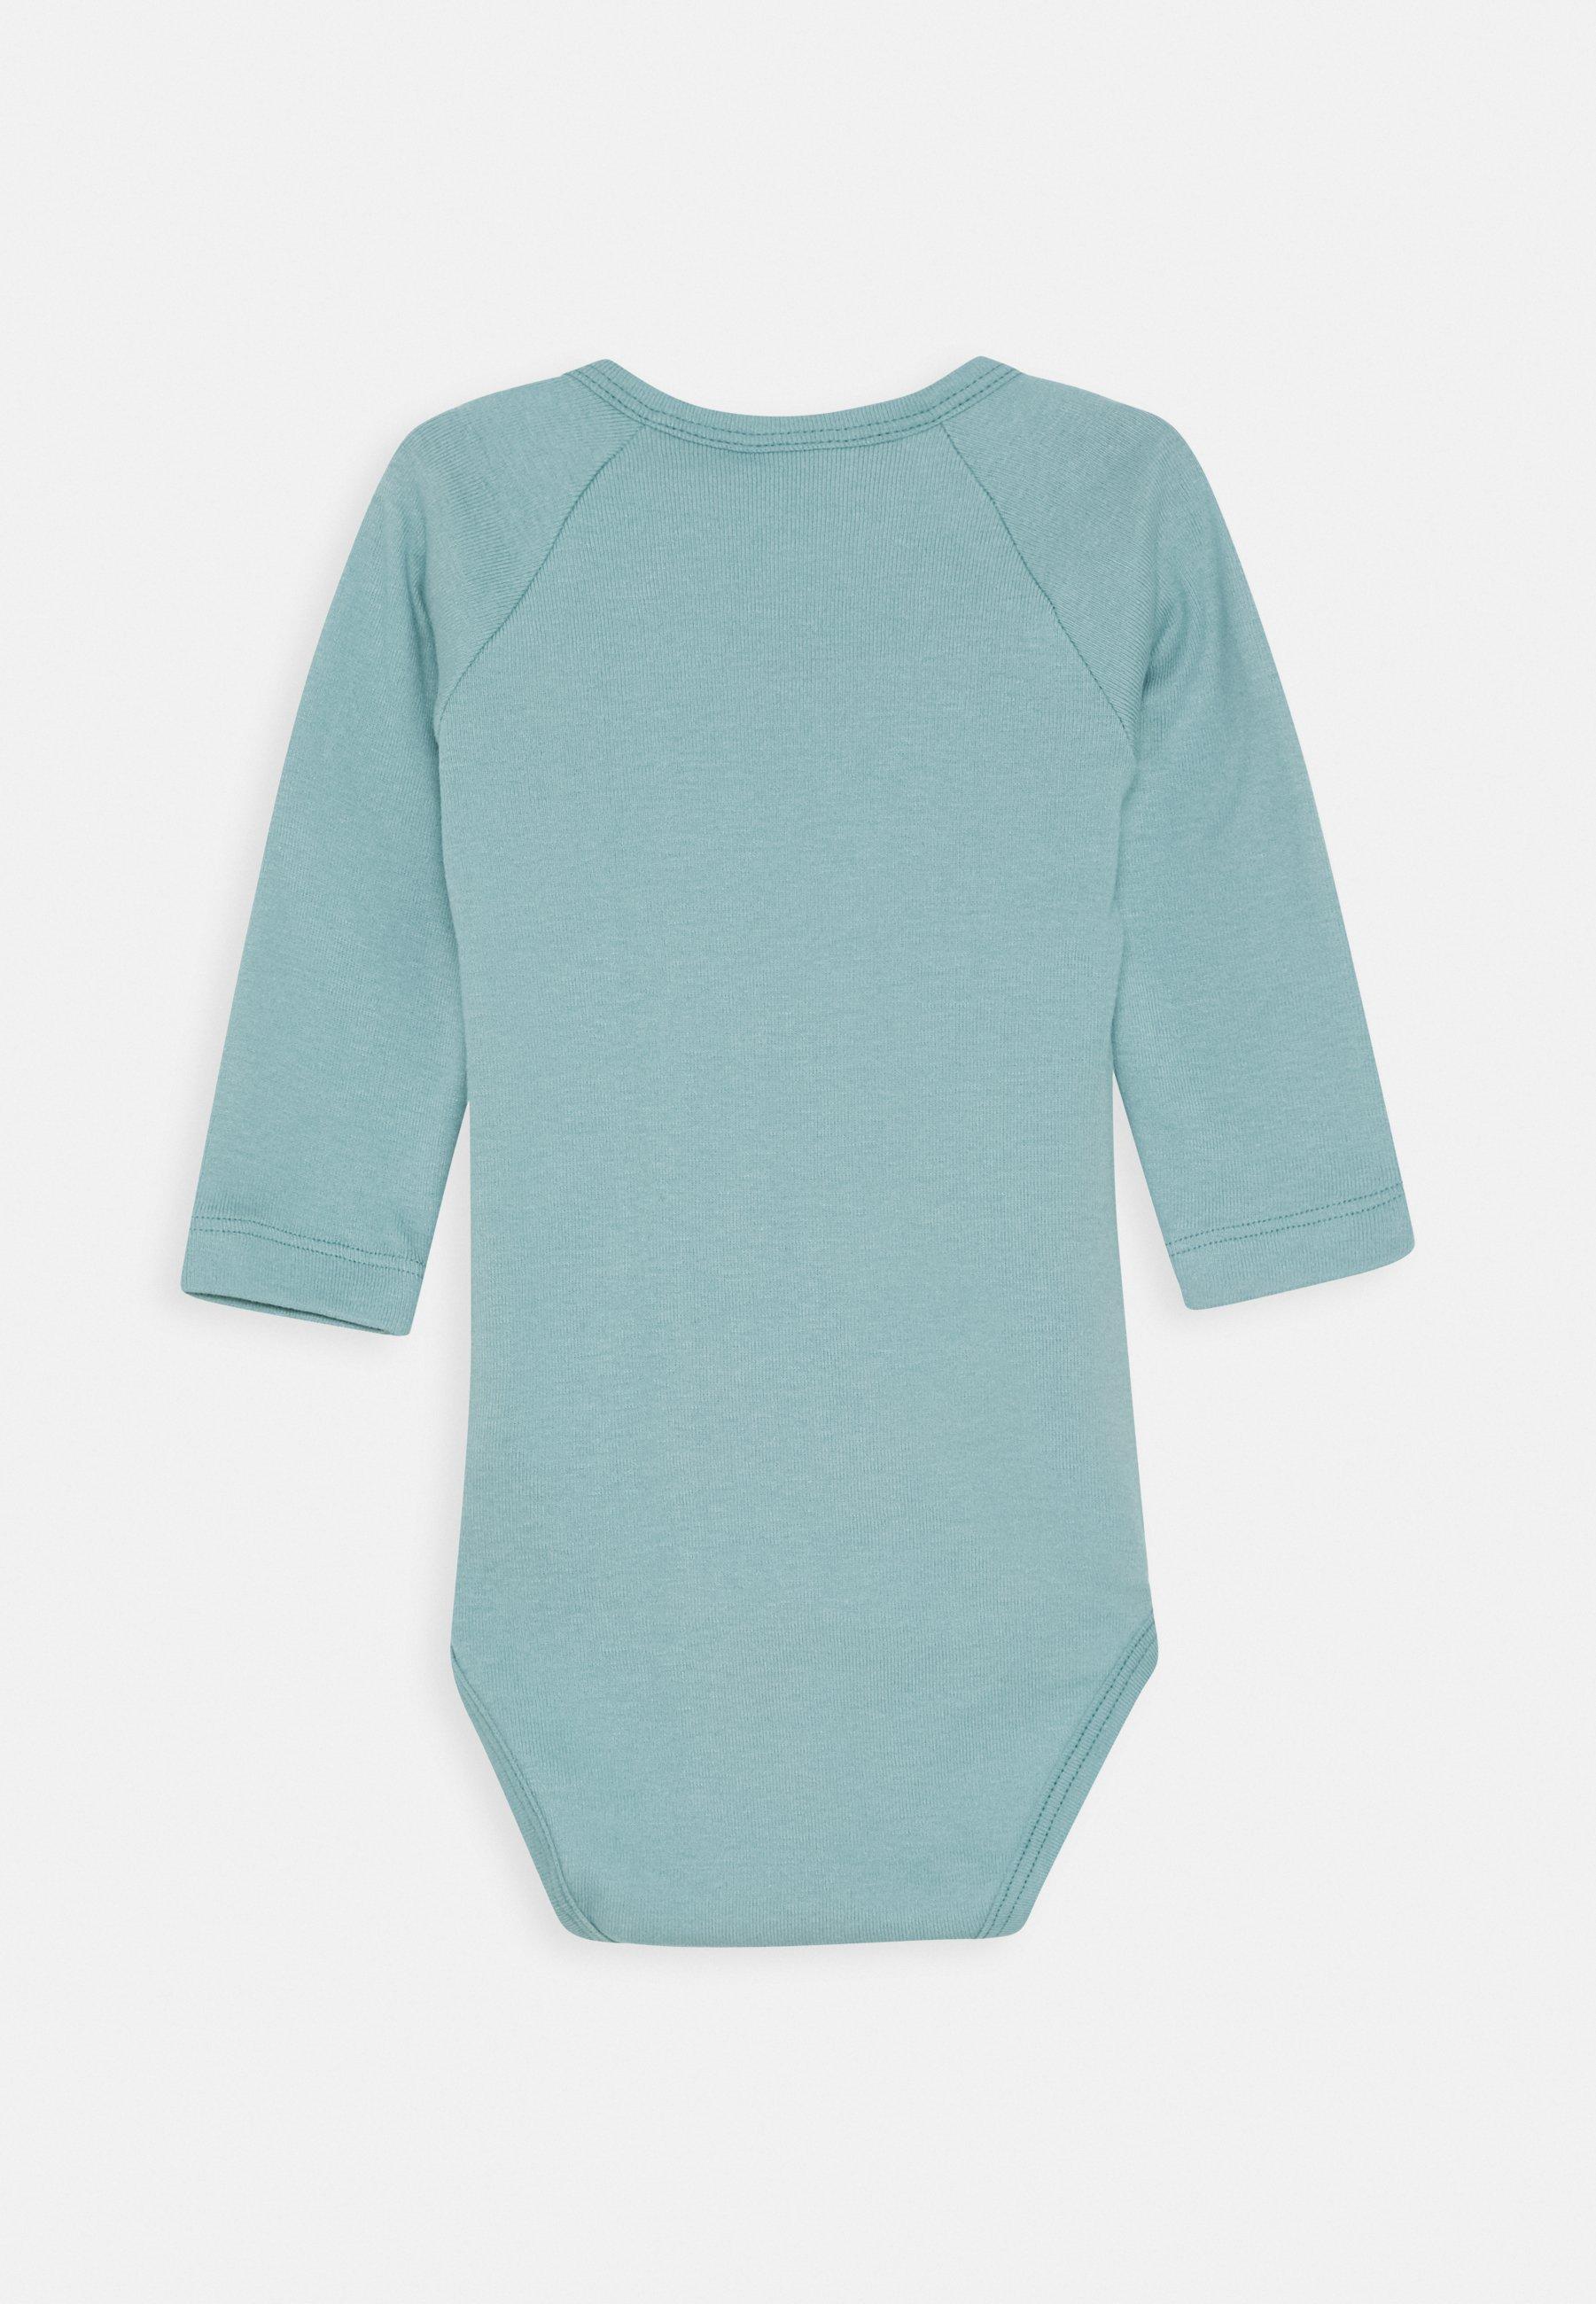 Sanetta Wrapover Longsleeve Multipack Baby 2 Pack - Body Blue Ice